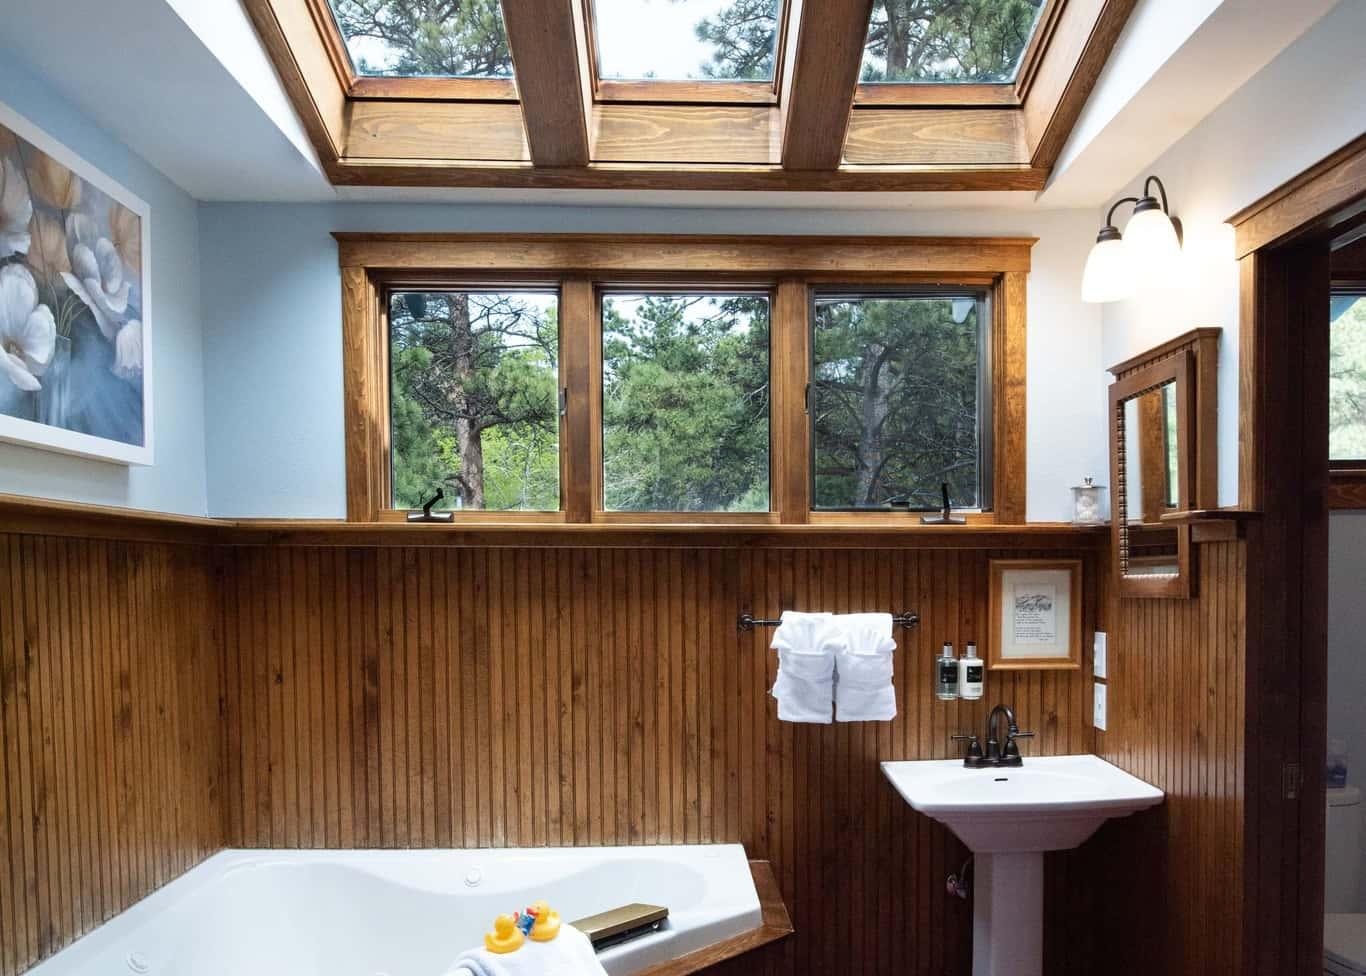 bathroom with skylight and windows